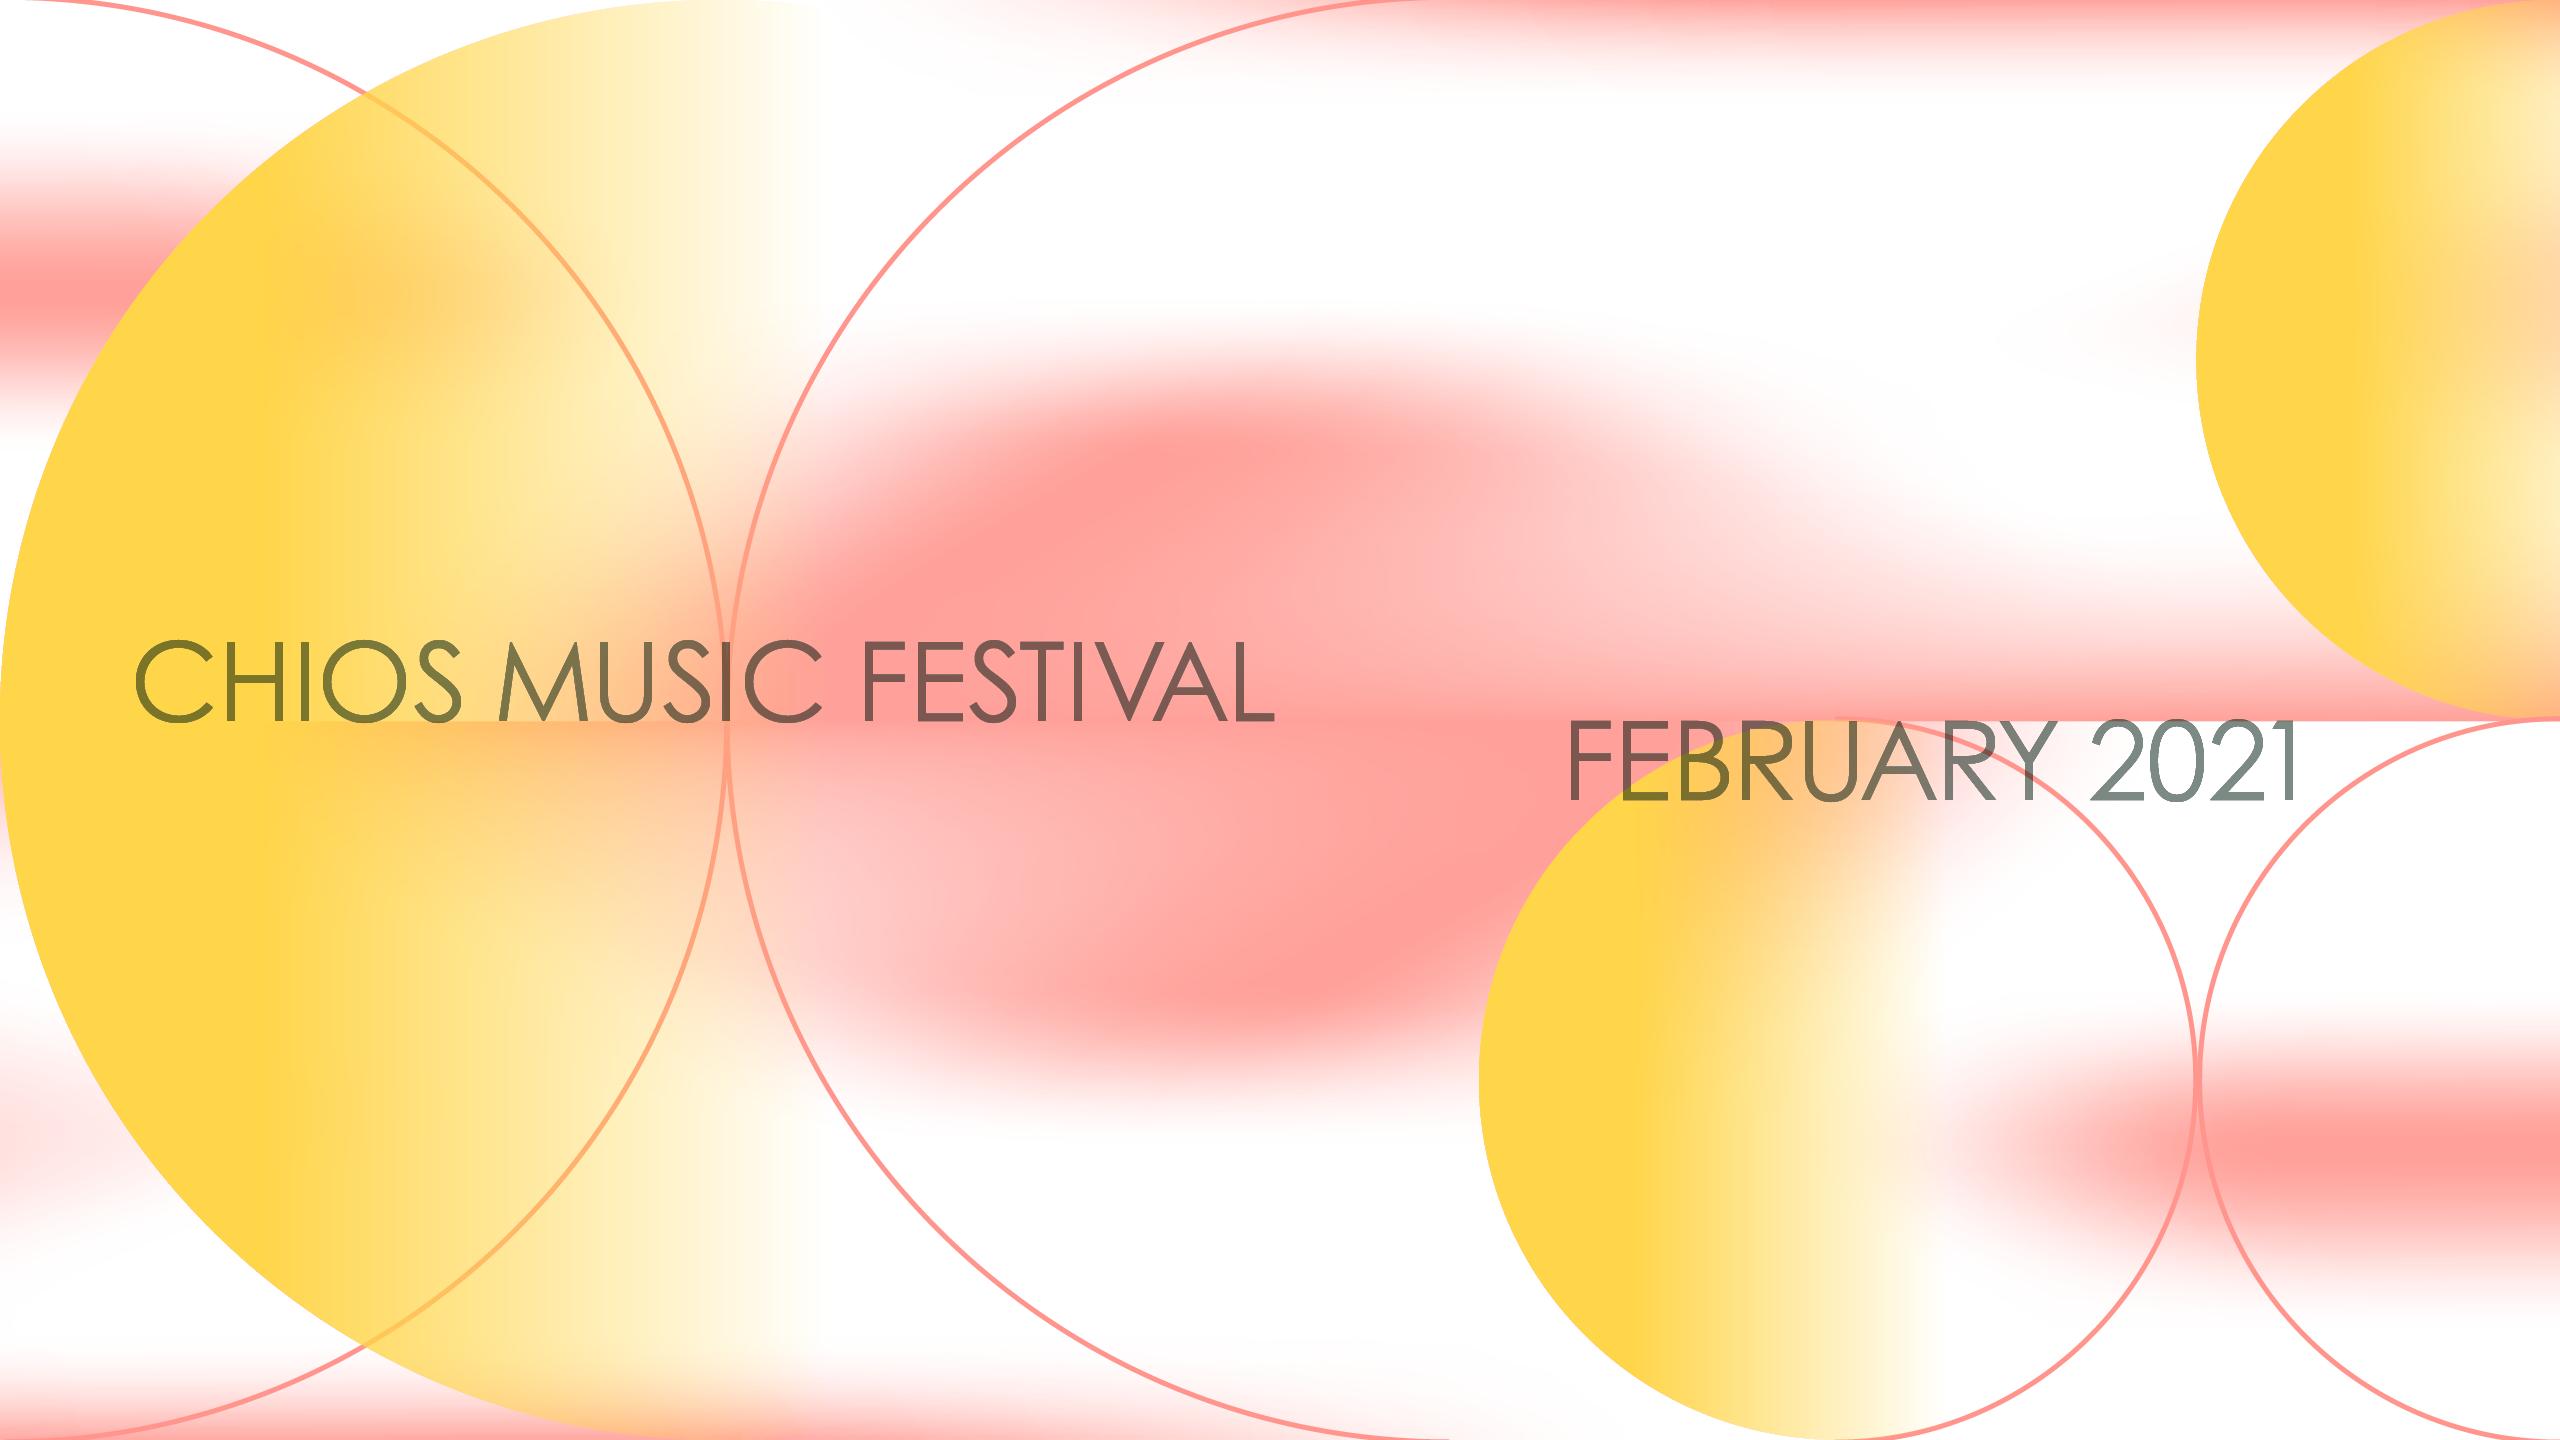 chios music festival february 2021